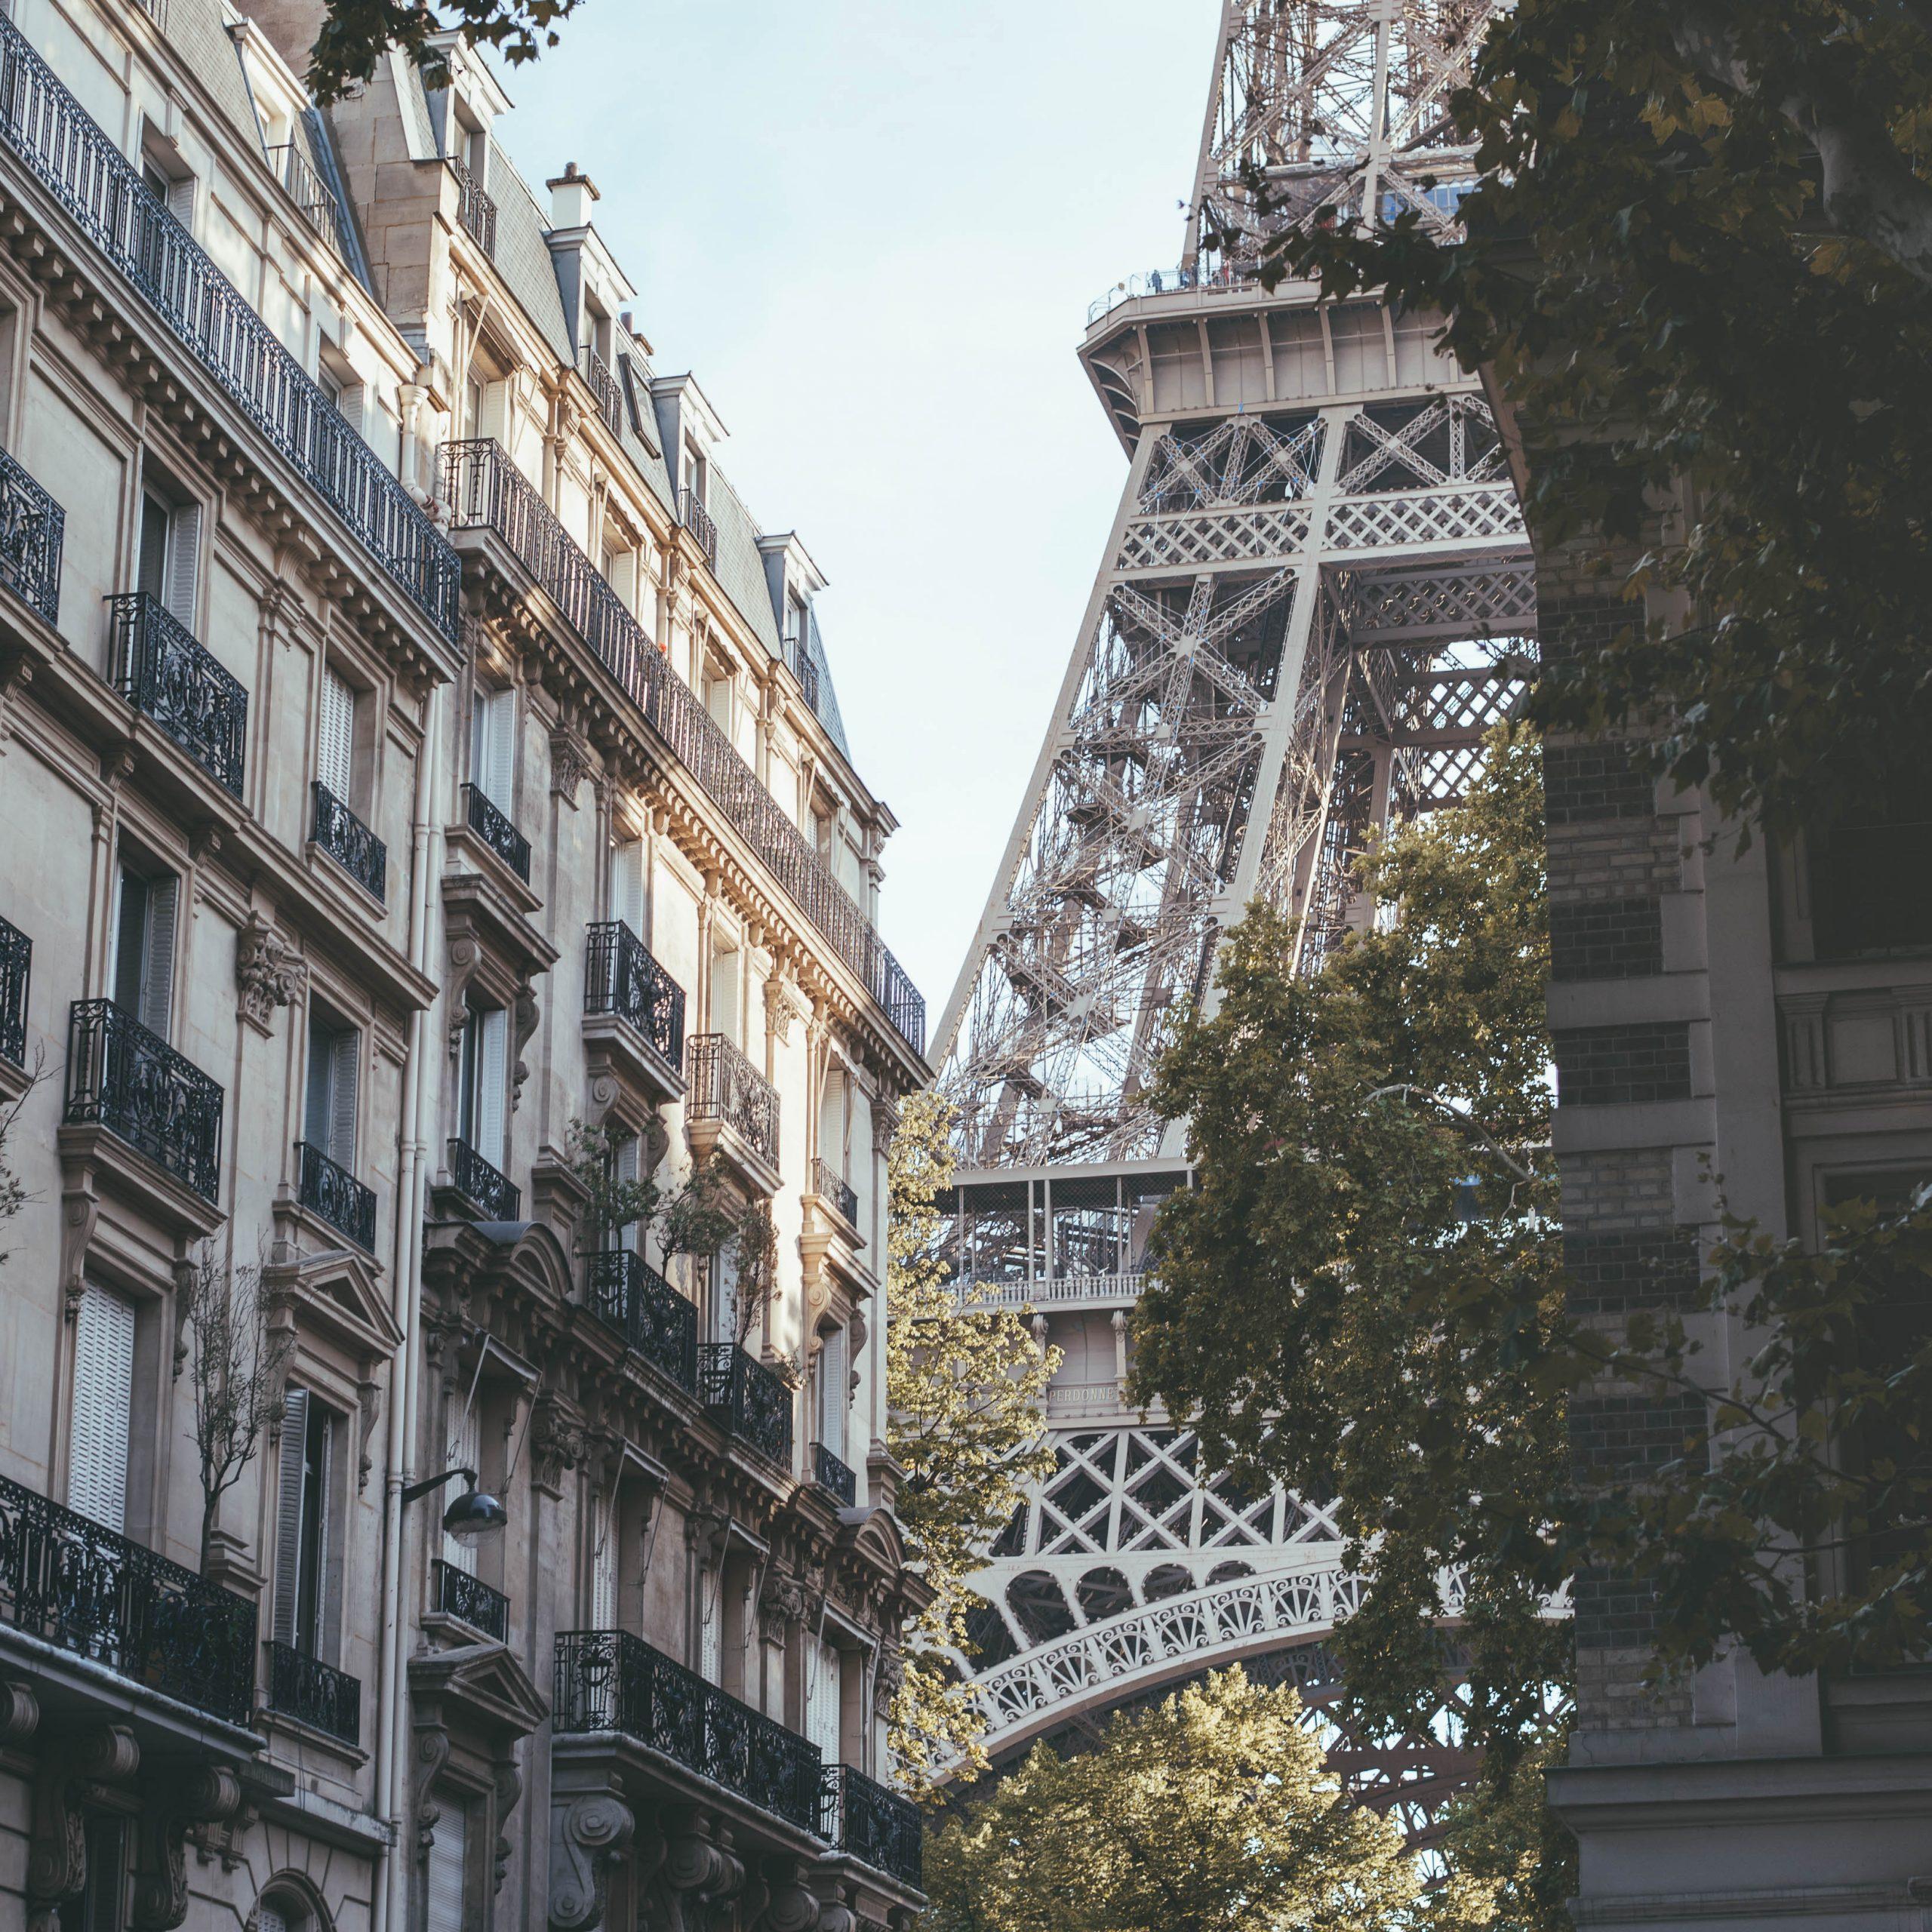 Best view of the Eiffel Tower from Rue de l'université